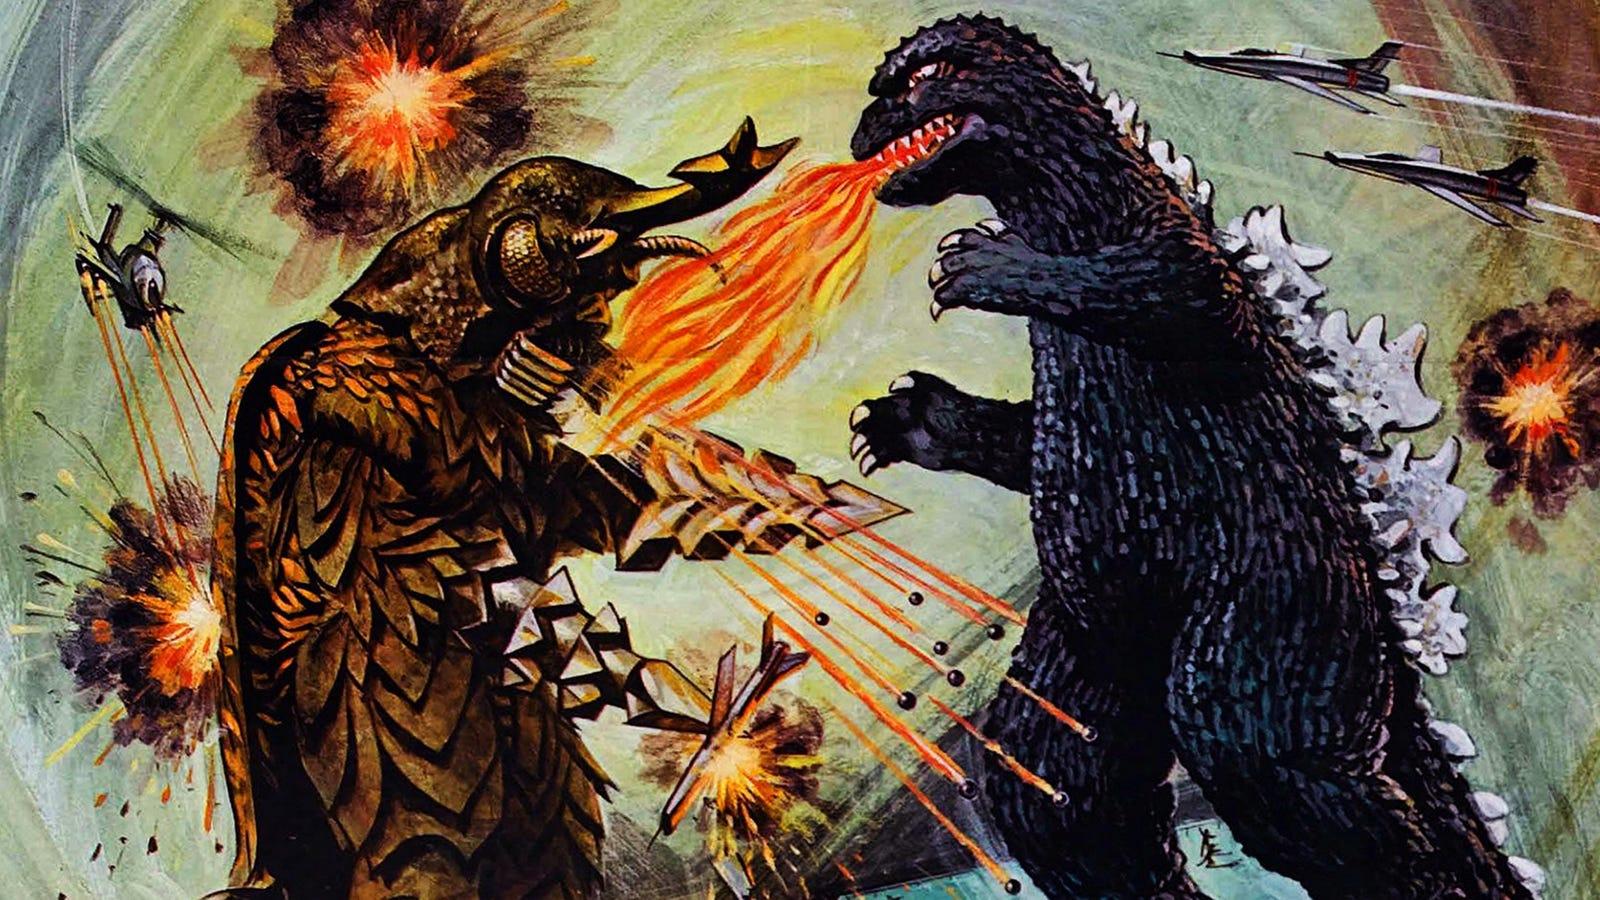 Toho is planning a Godzilla cinematic universe, even ...